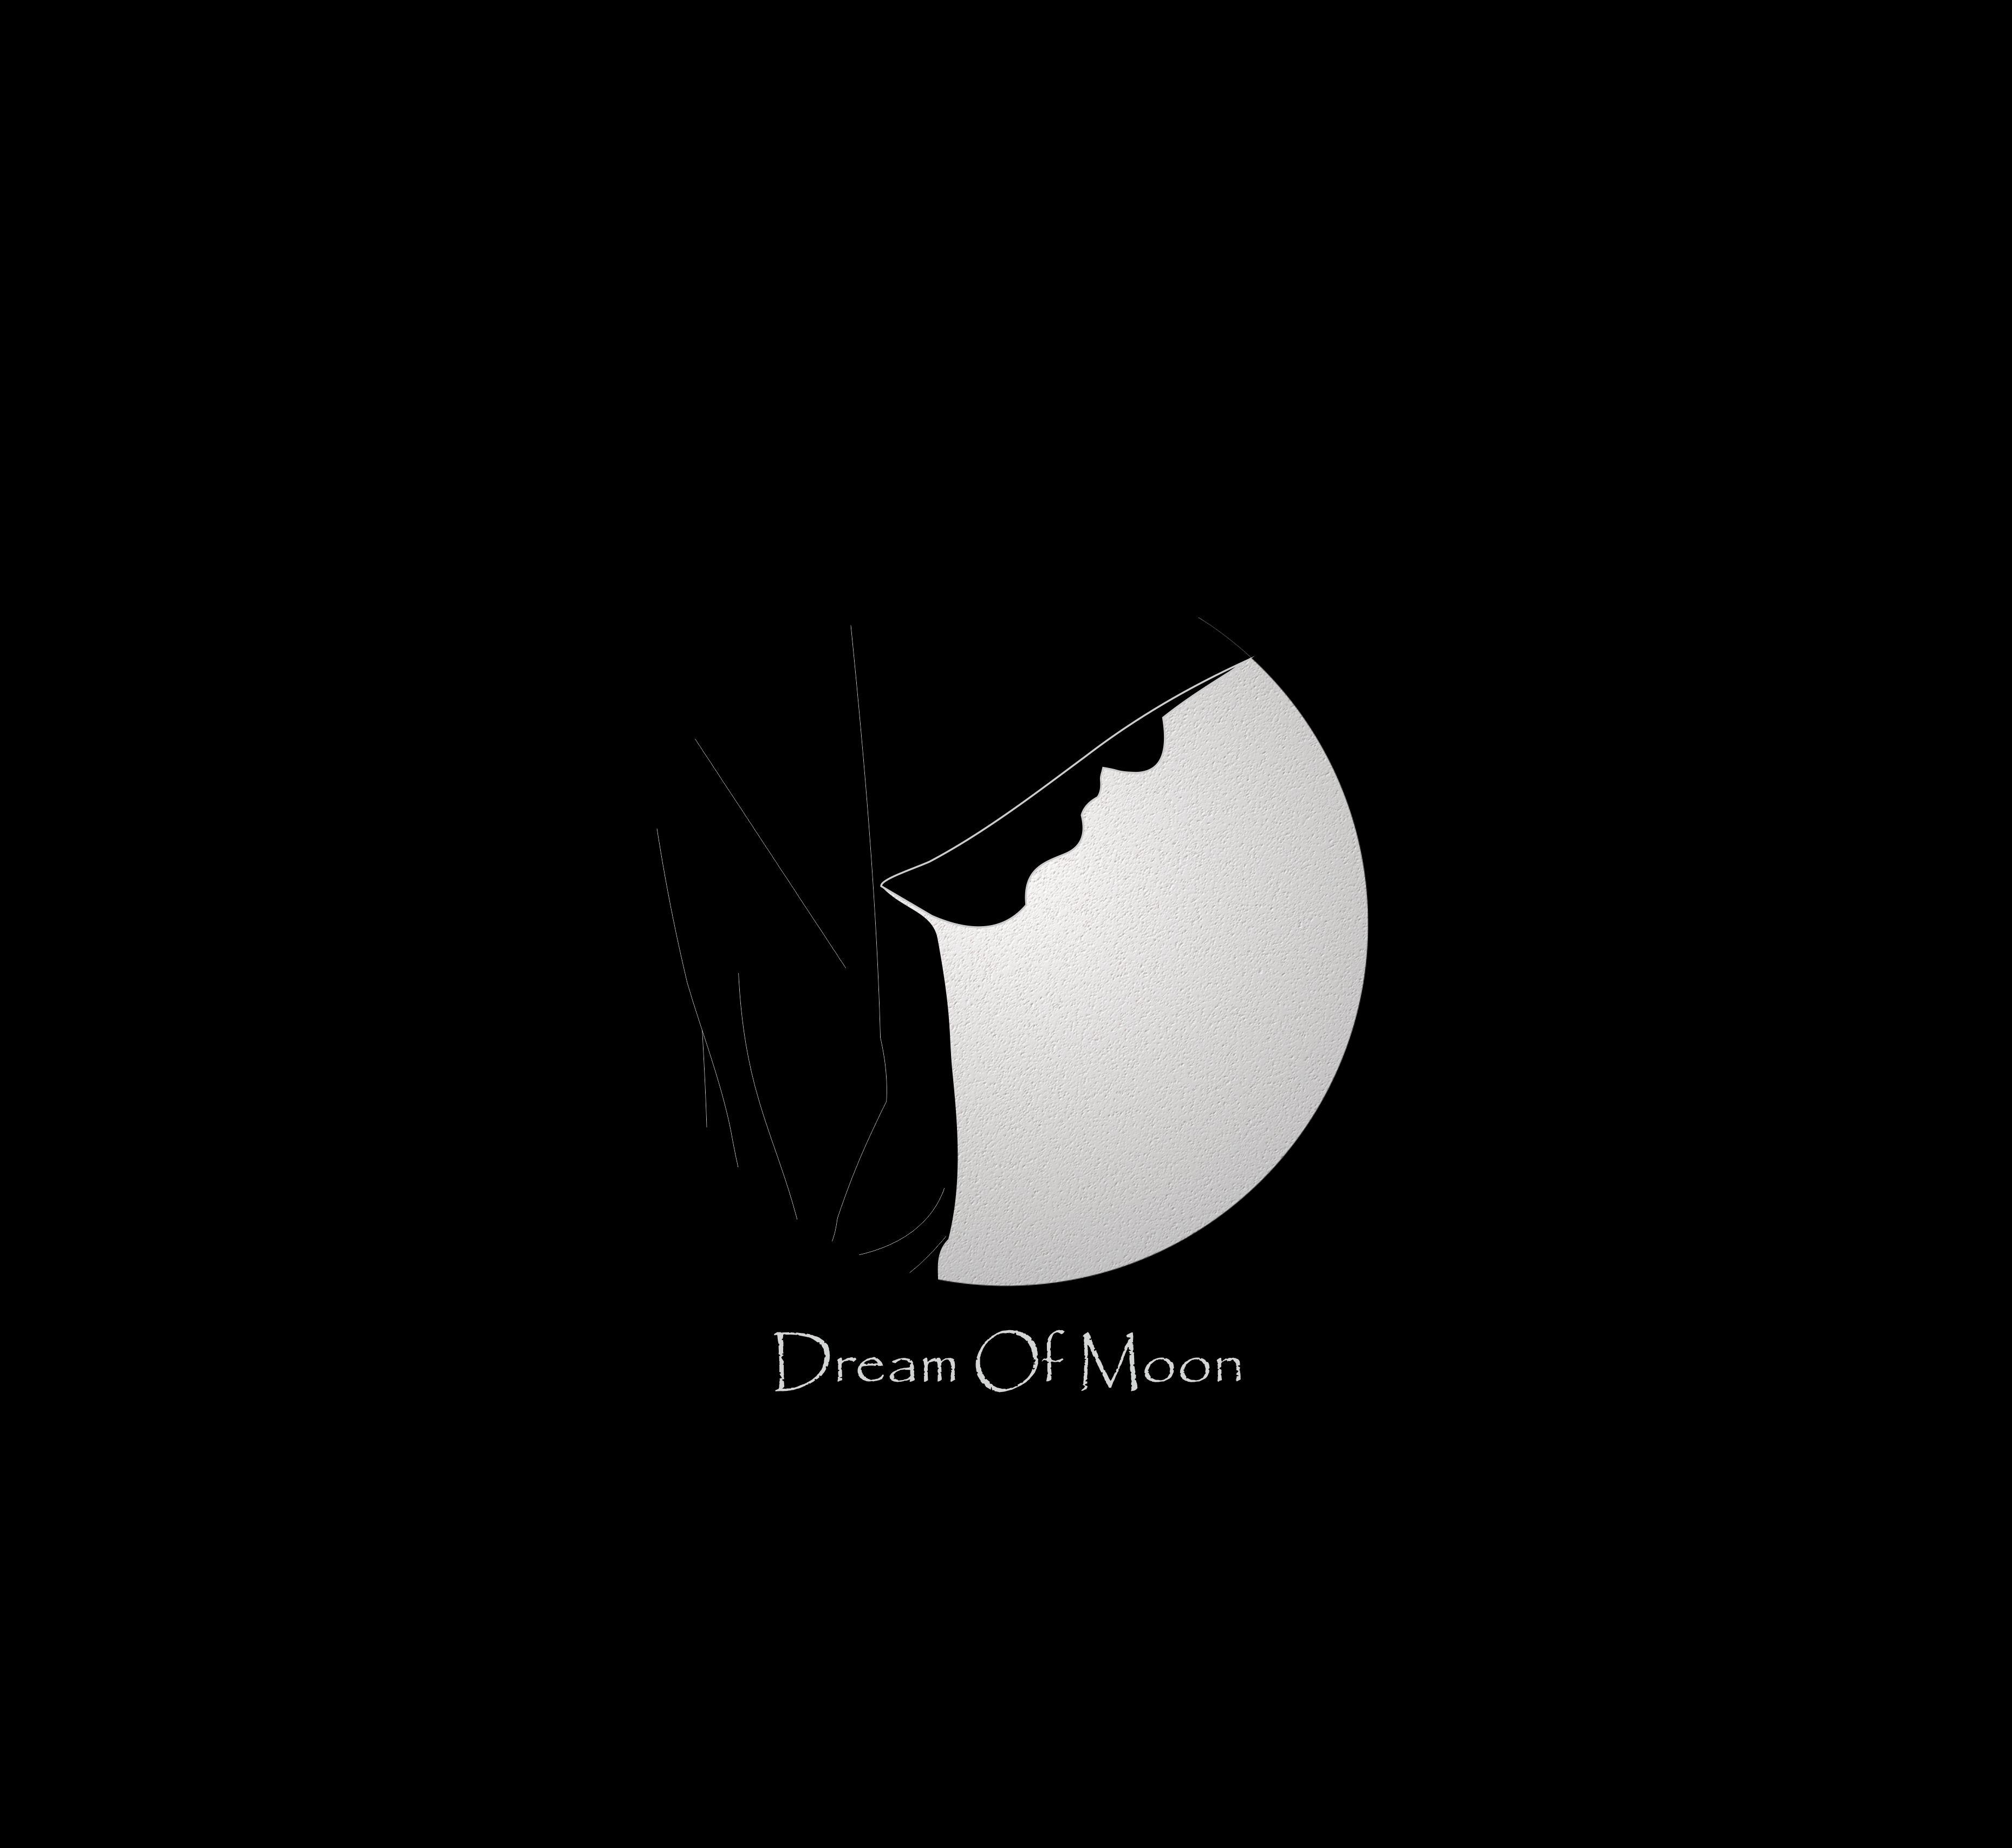 Dream of de moon